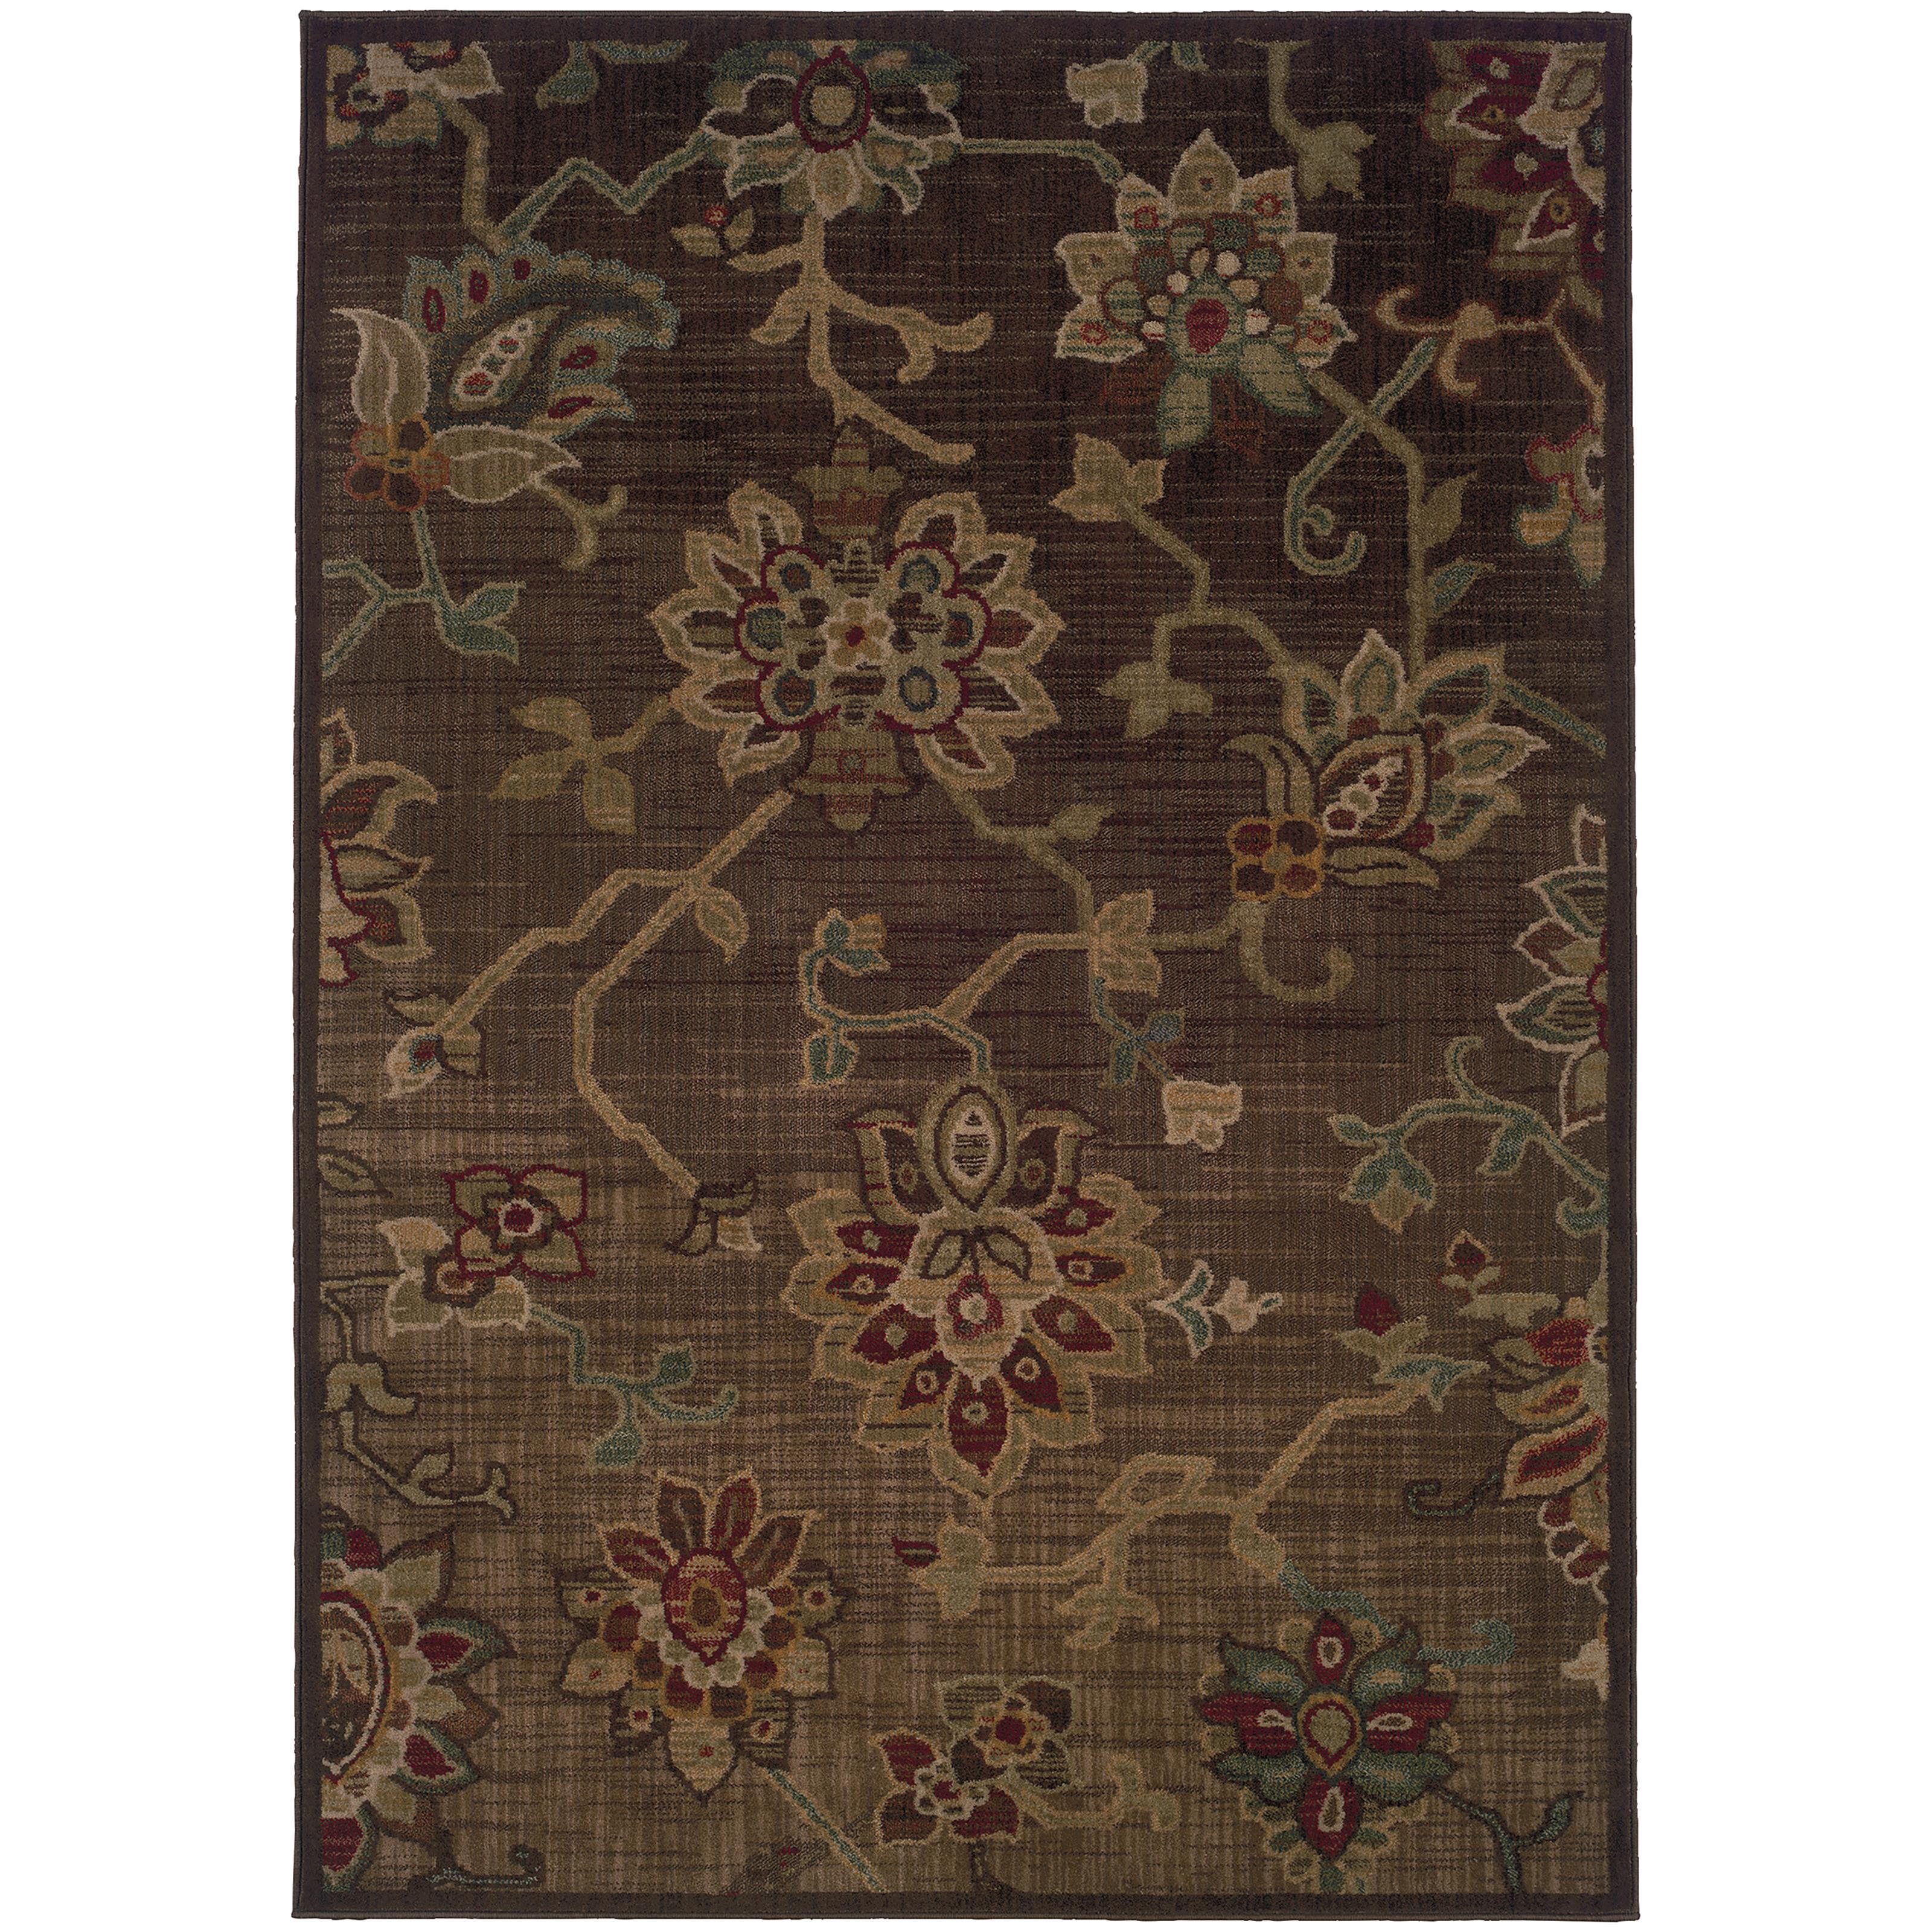 "Oriental Weavers Allure 9'10"" X 12' 9"" Rug - Item Number: A054C1300390ST"